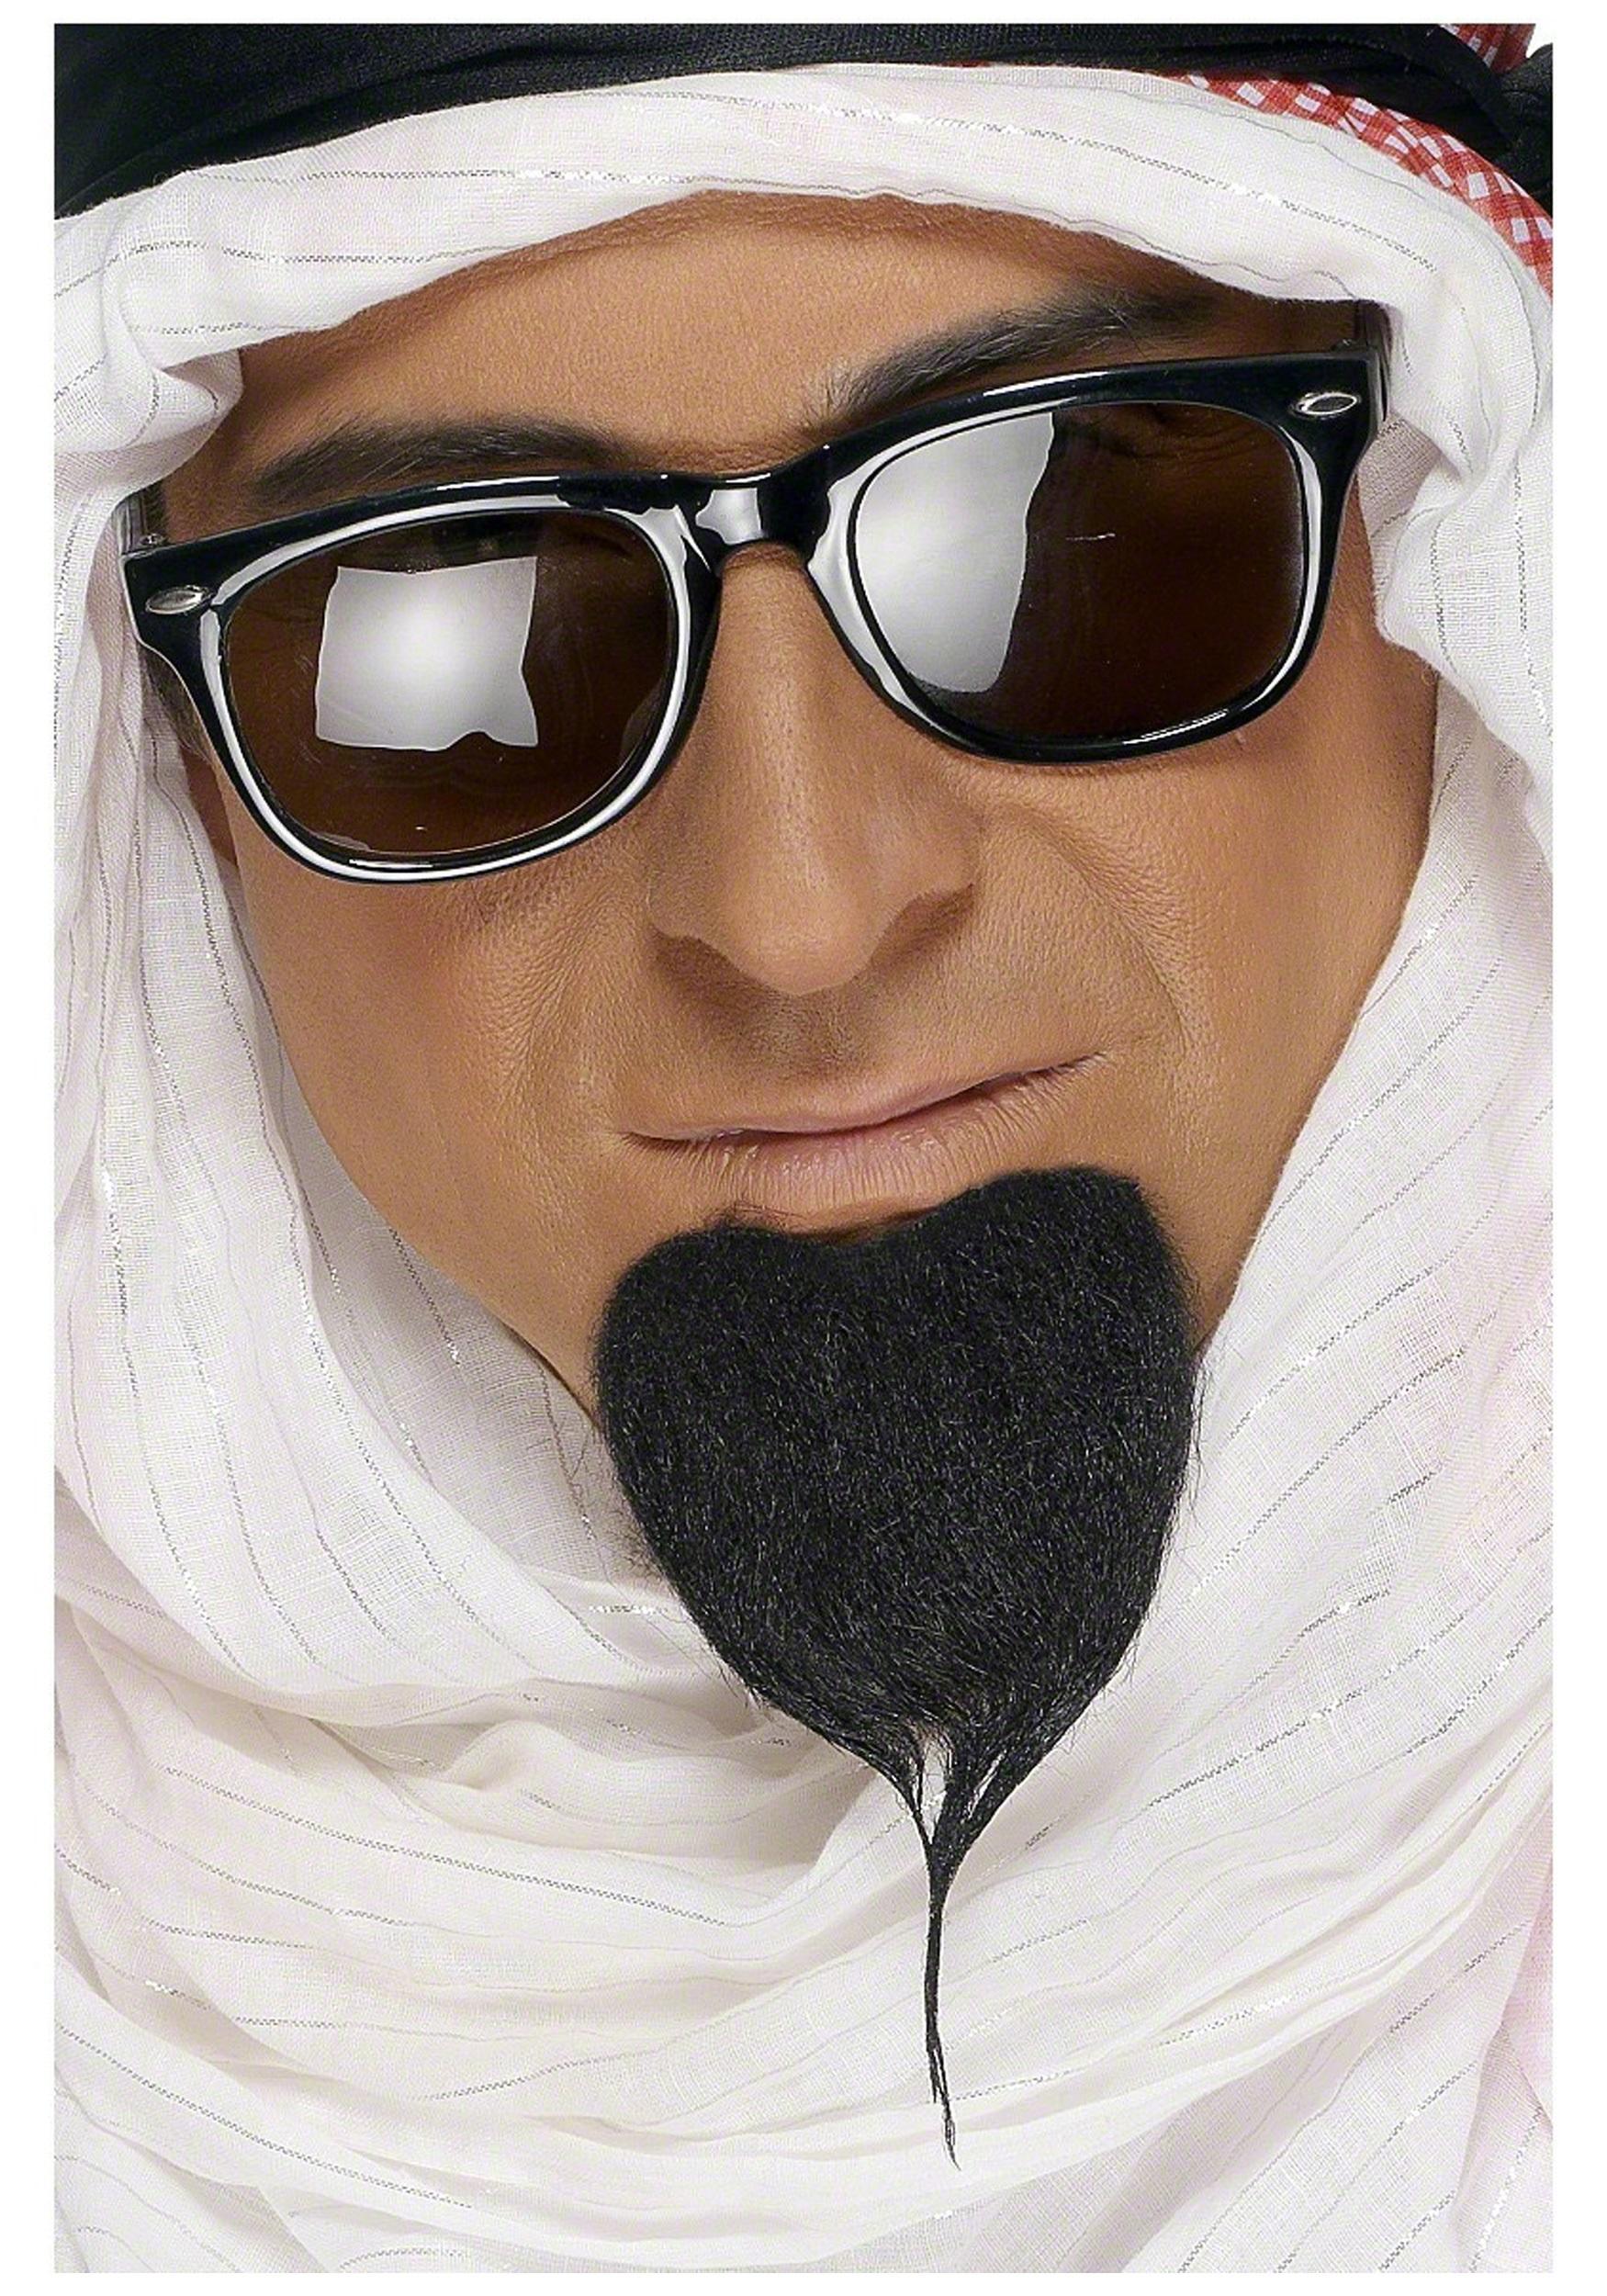 arabian genie facial hair - funny costume ideas